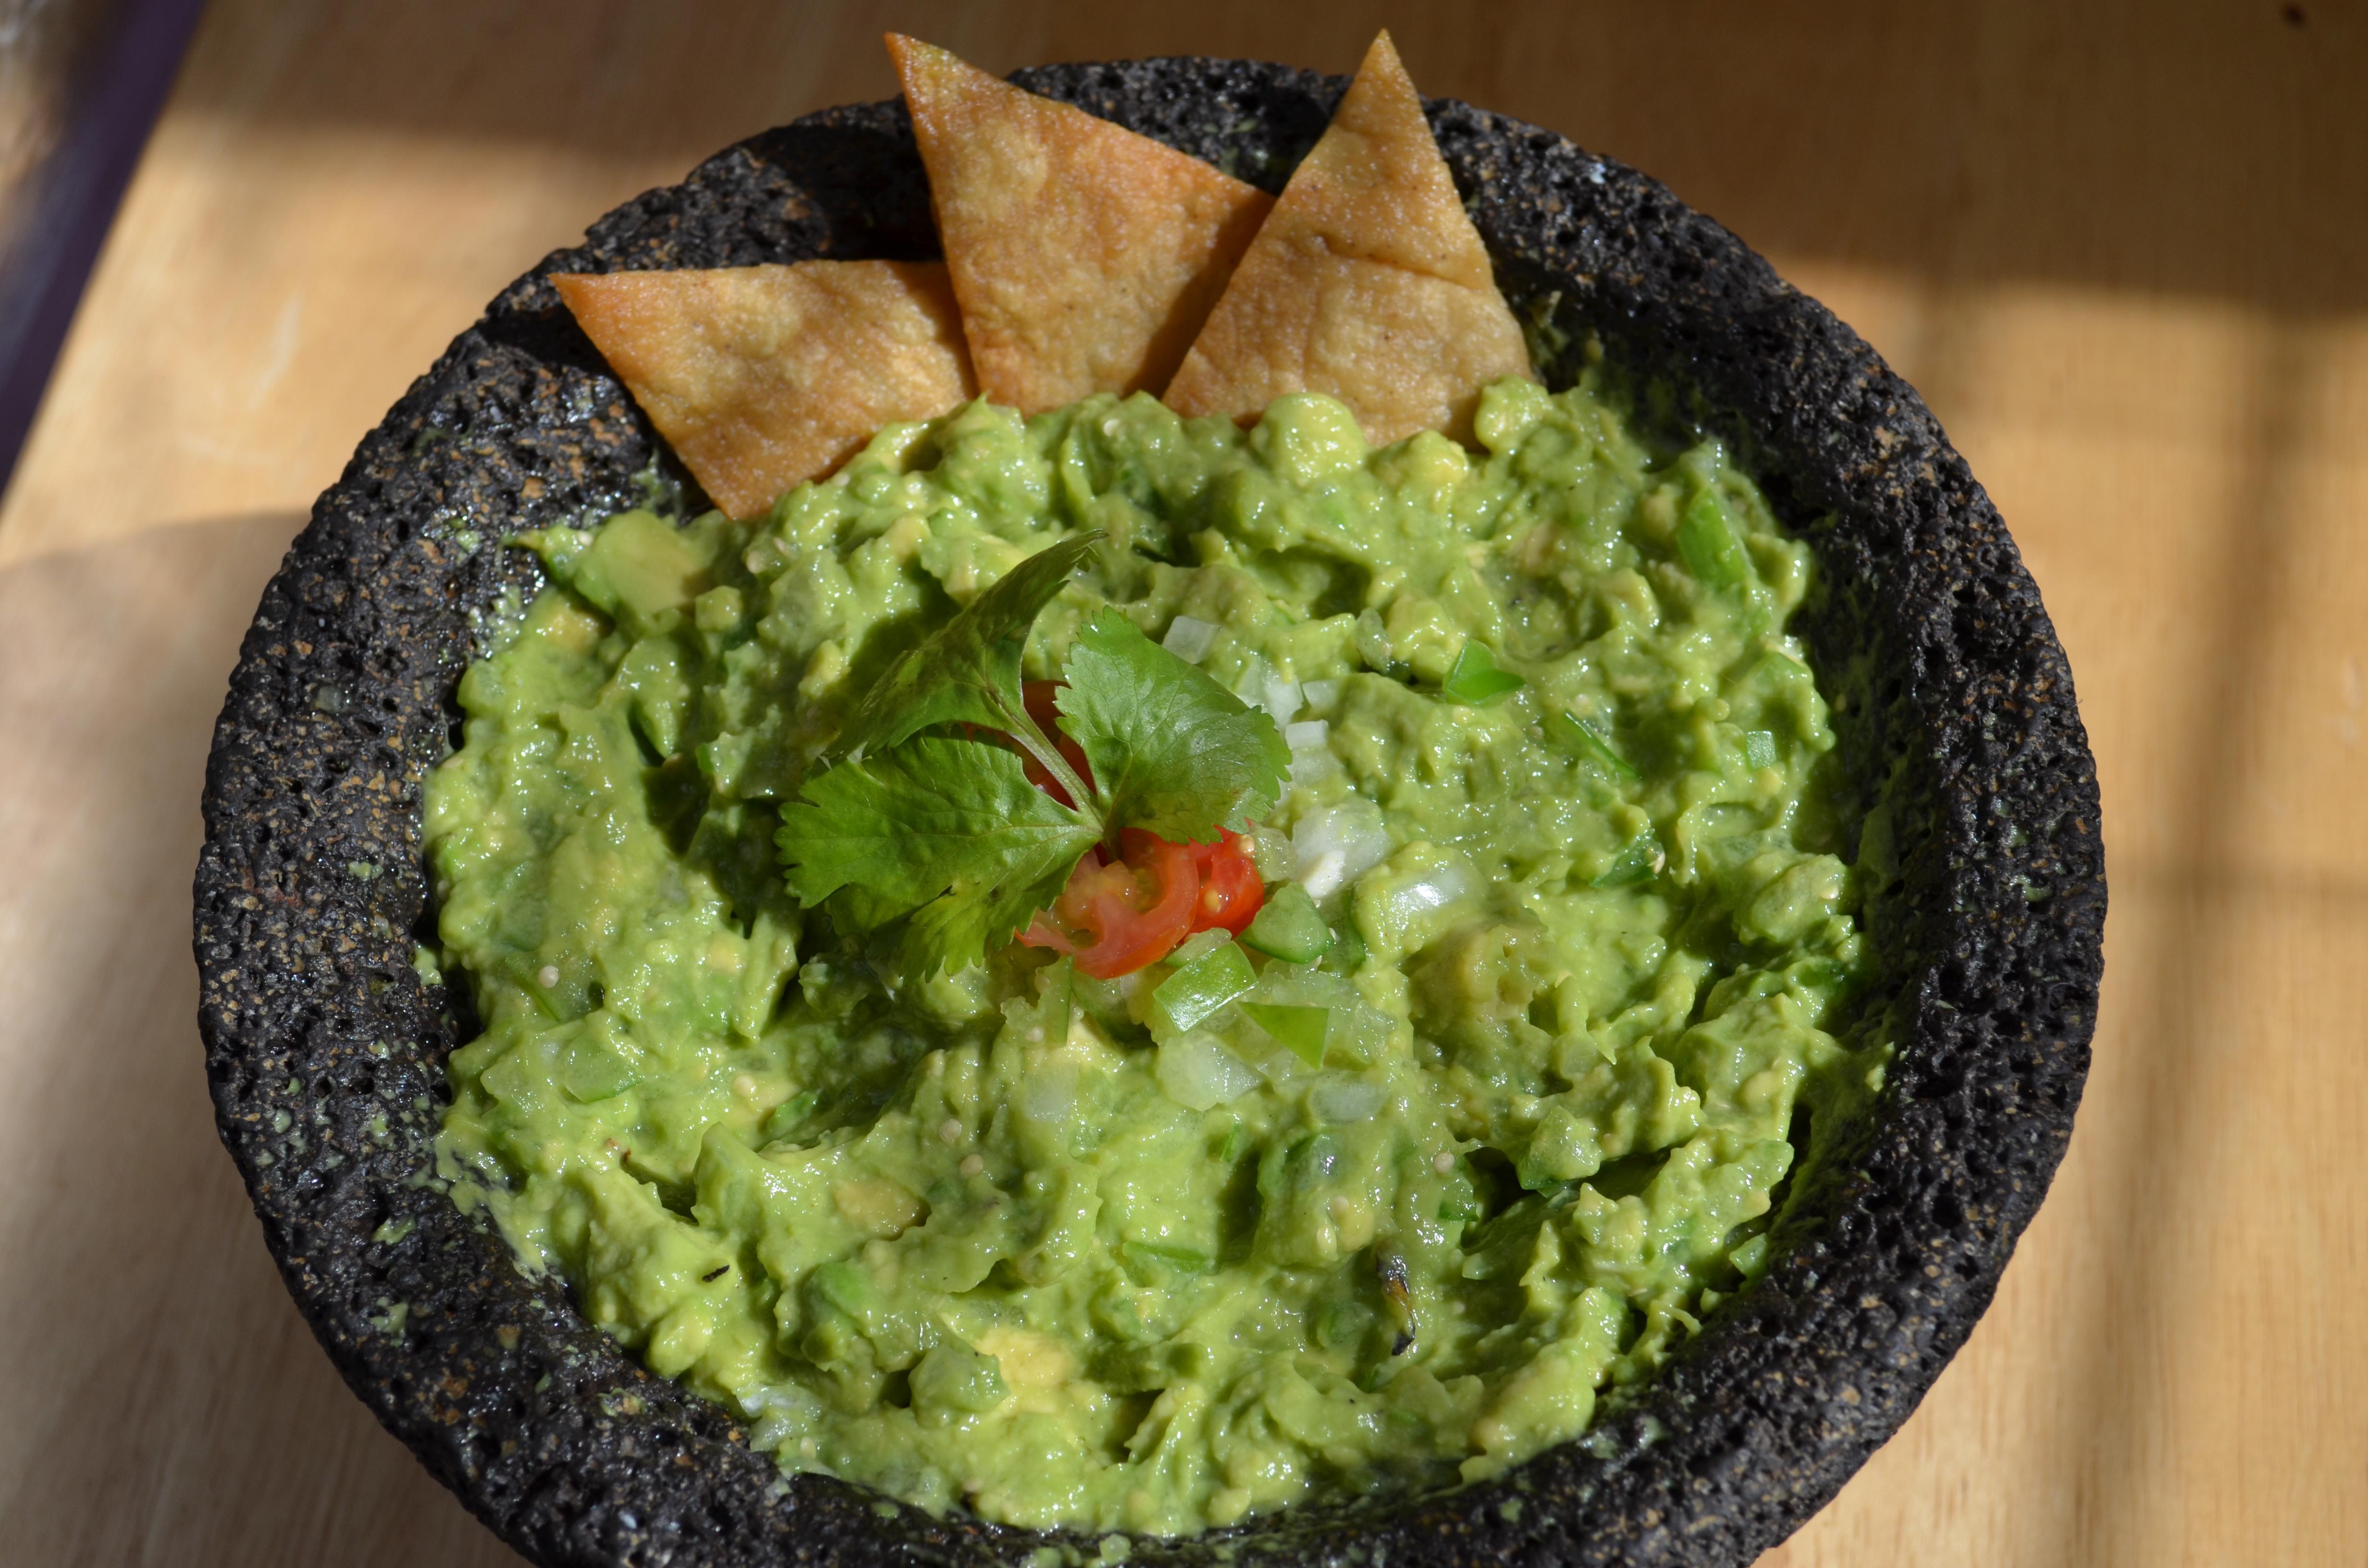 Avocado-tomatillo guacamole | Bread and Tortillas